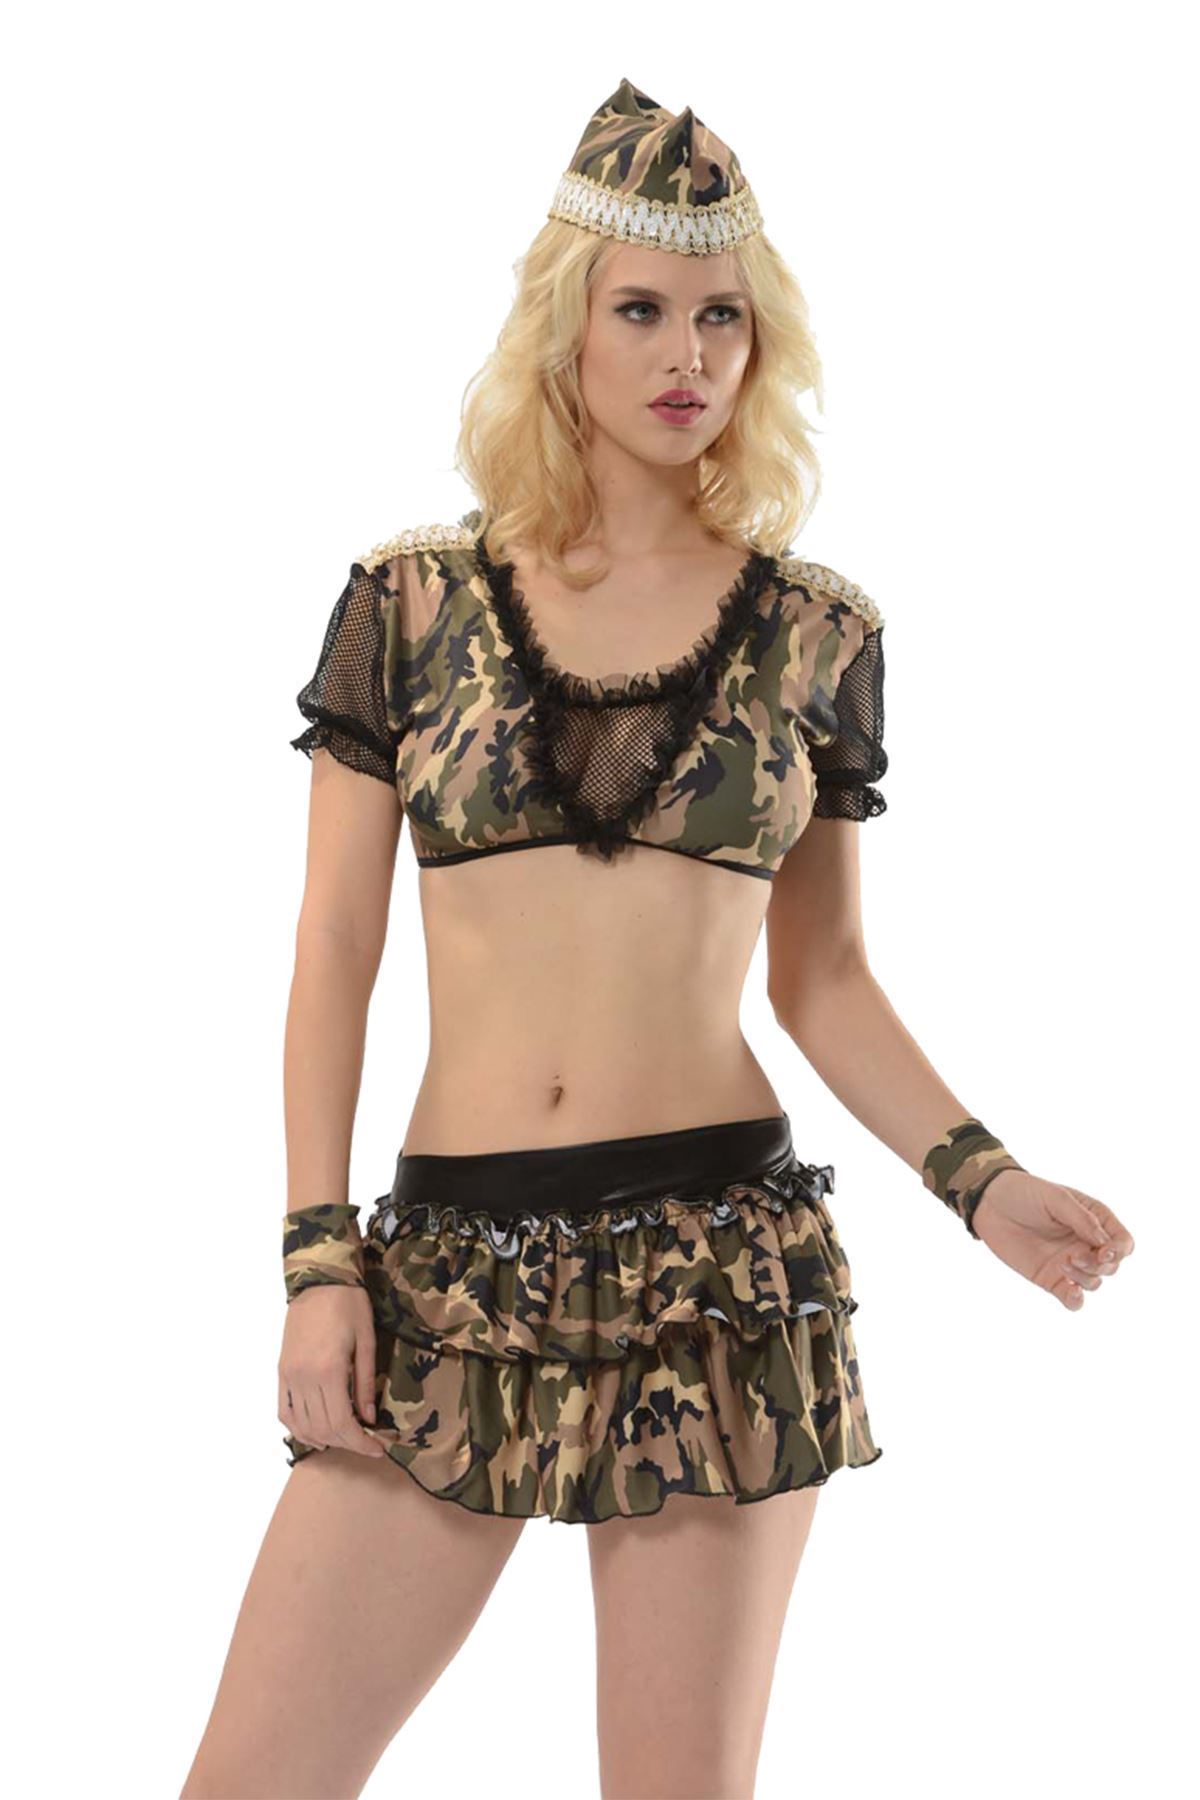 Sistina 4014 Fantazi Asker Kostümü